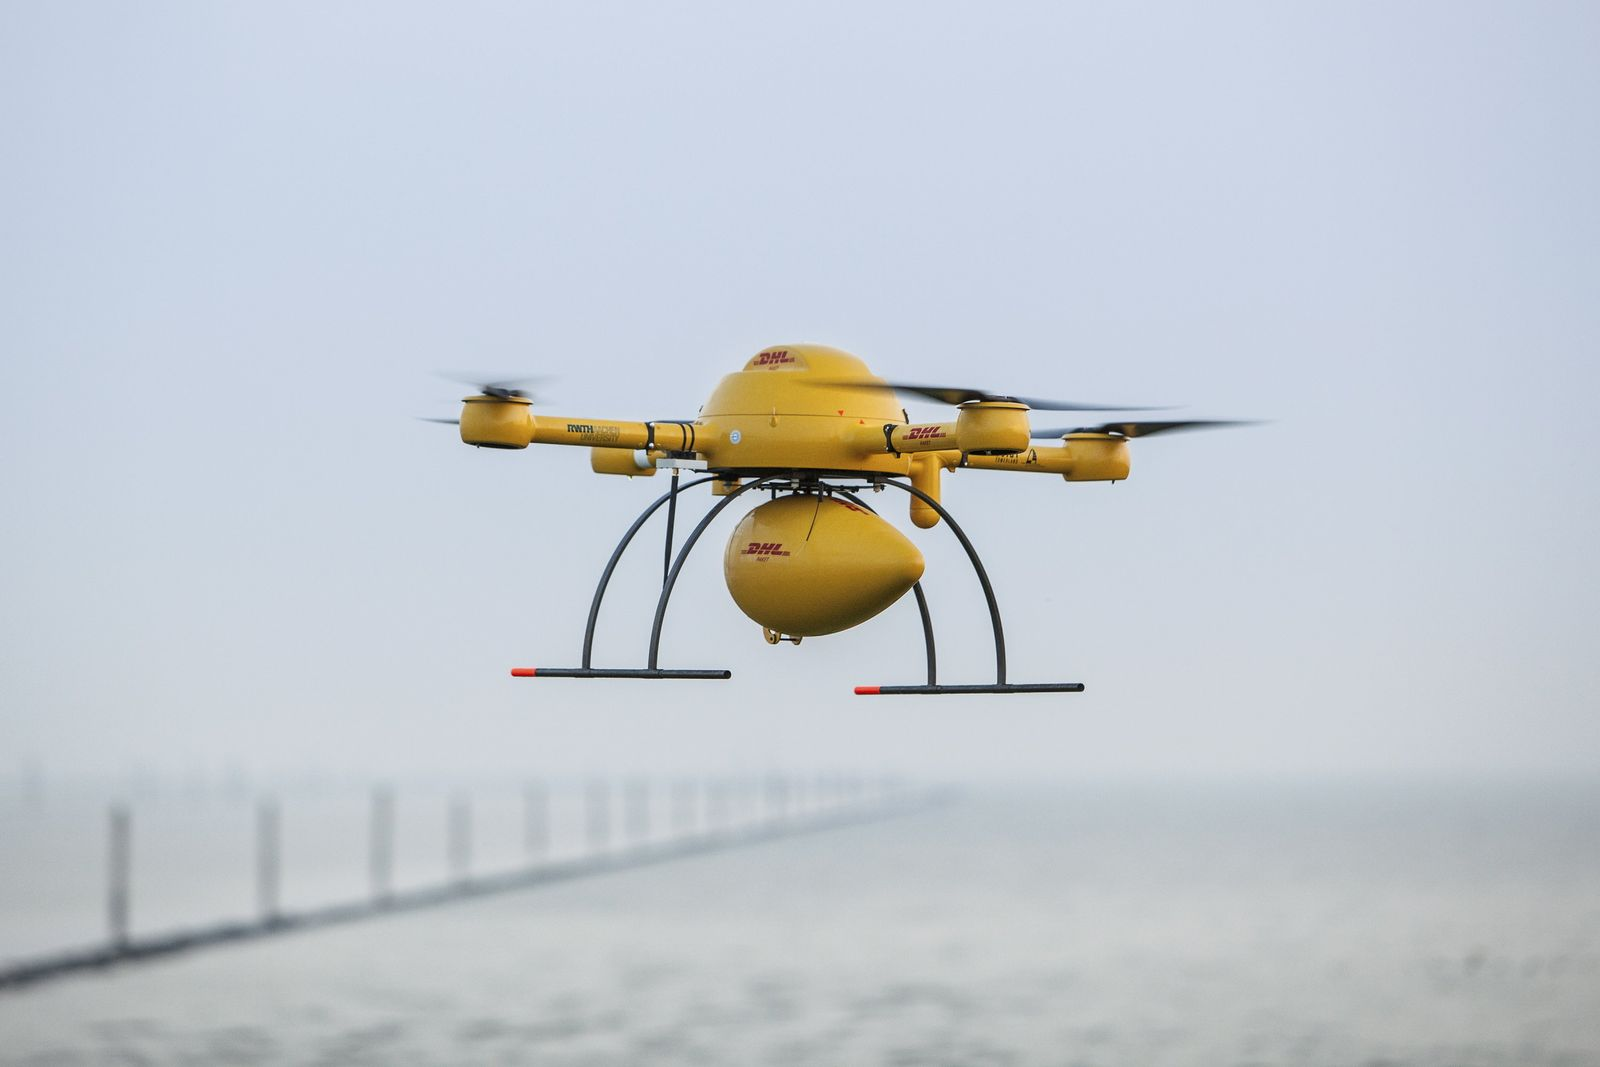 DHL / Paket-Drohne im Test